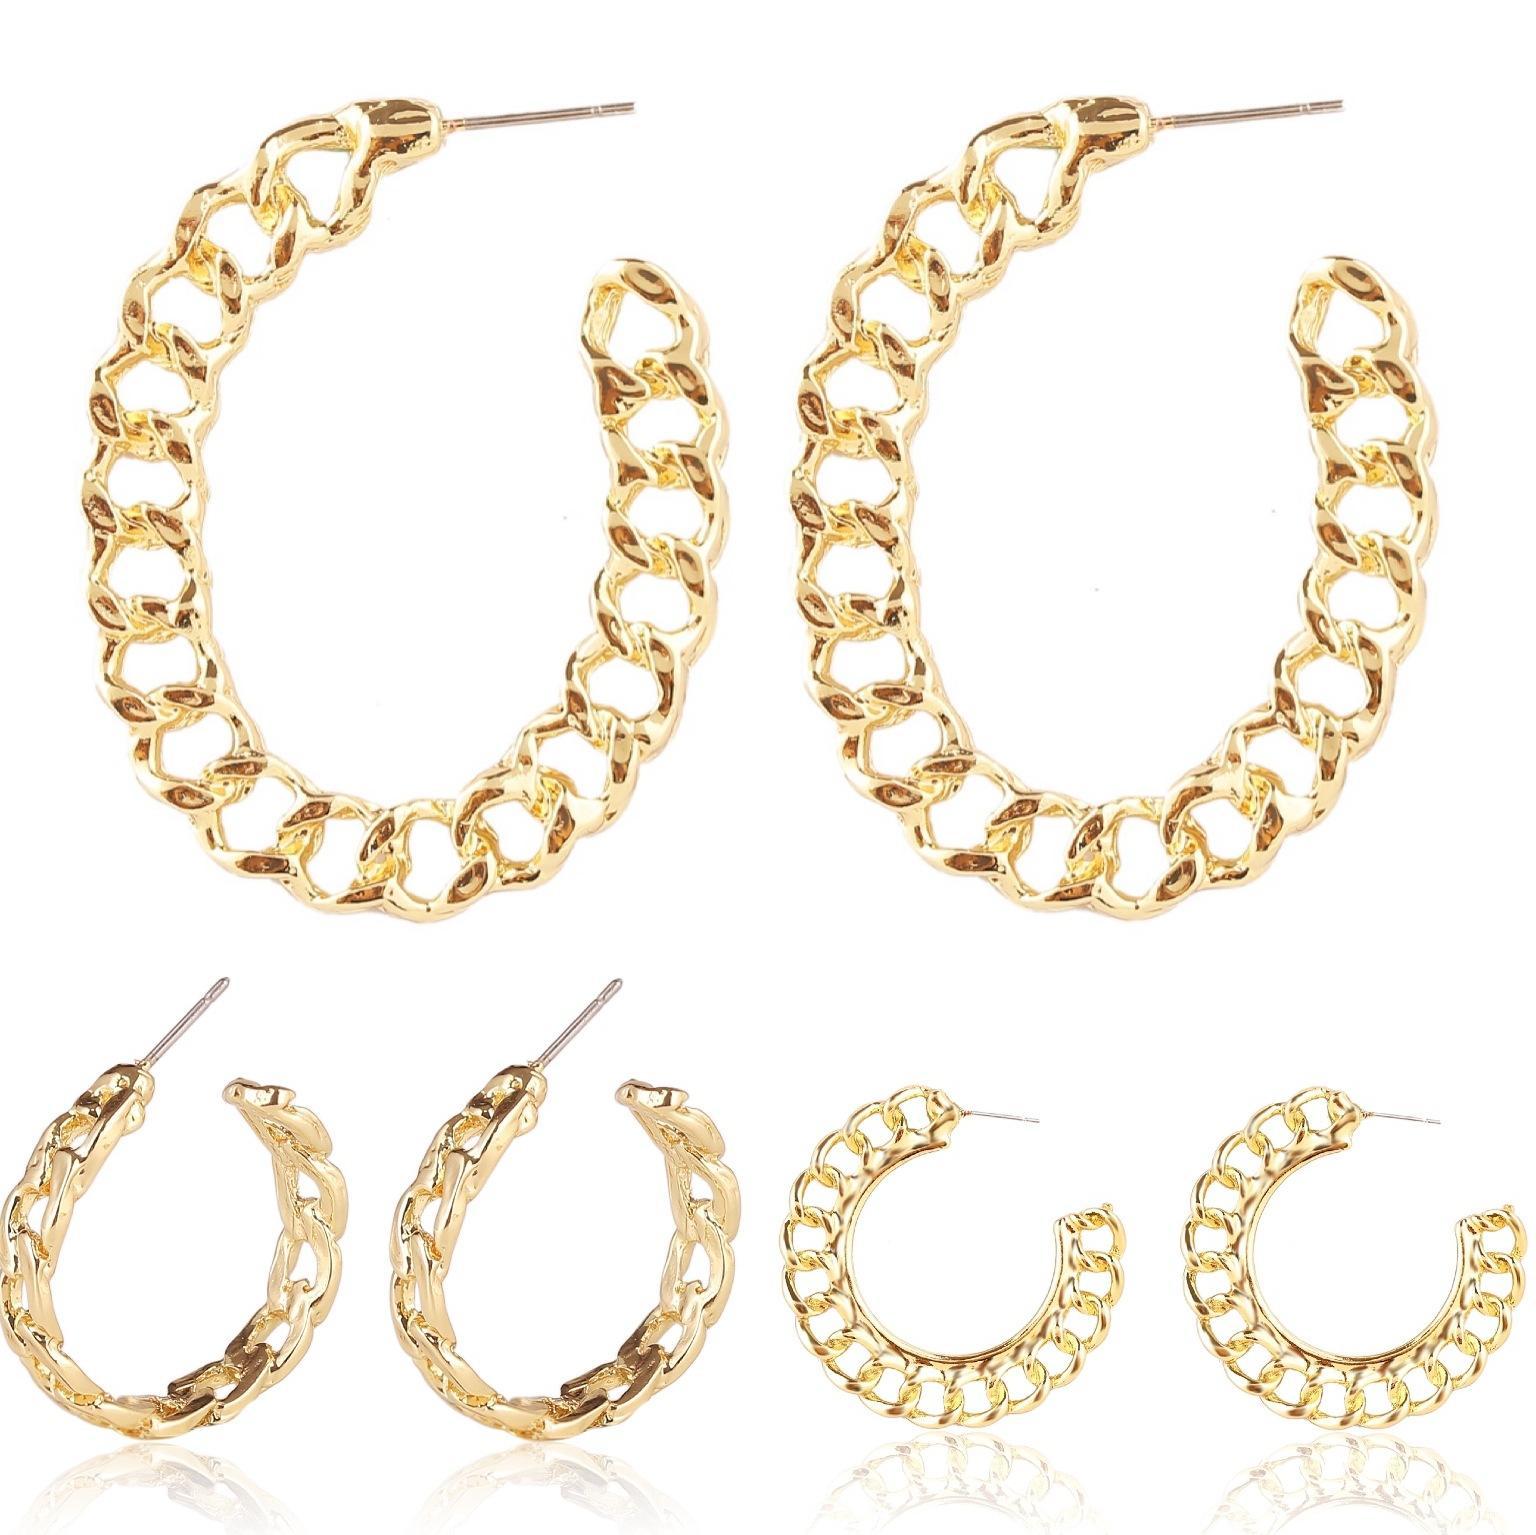 2020 Women Gold Hoop Earrings Chain Hypoallergenic Designer Ear Rings Fashion Jewelry Girls Hollow Out Earrings Hot Sale From Etsybuy 1 12 Dhgate Com